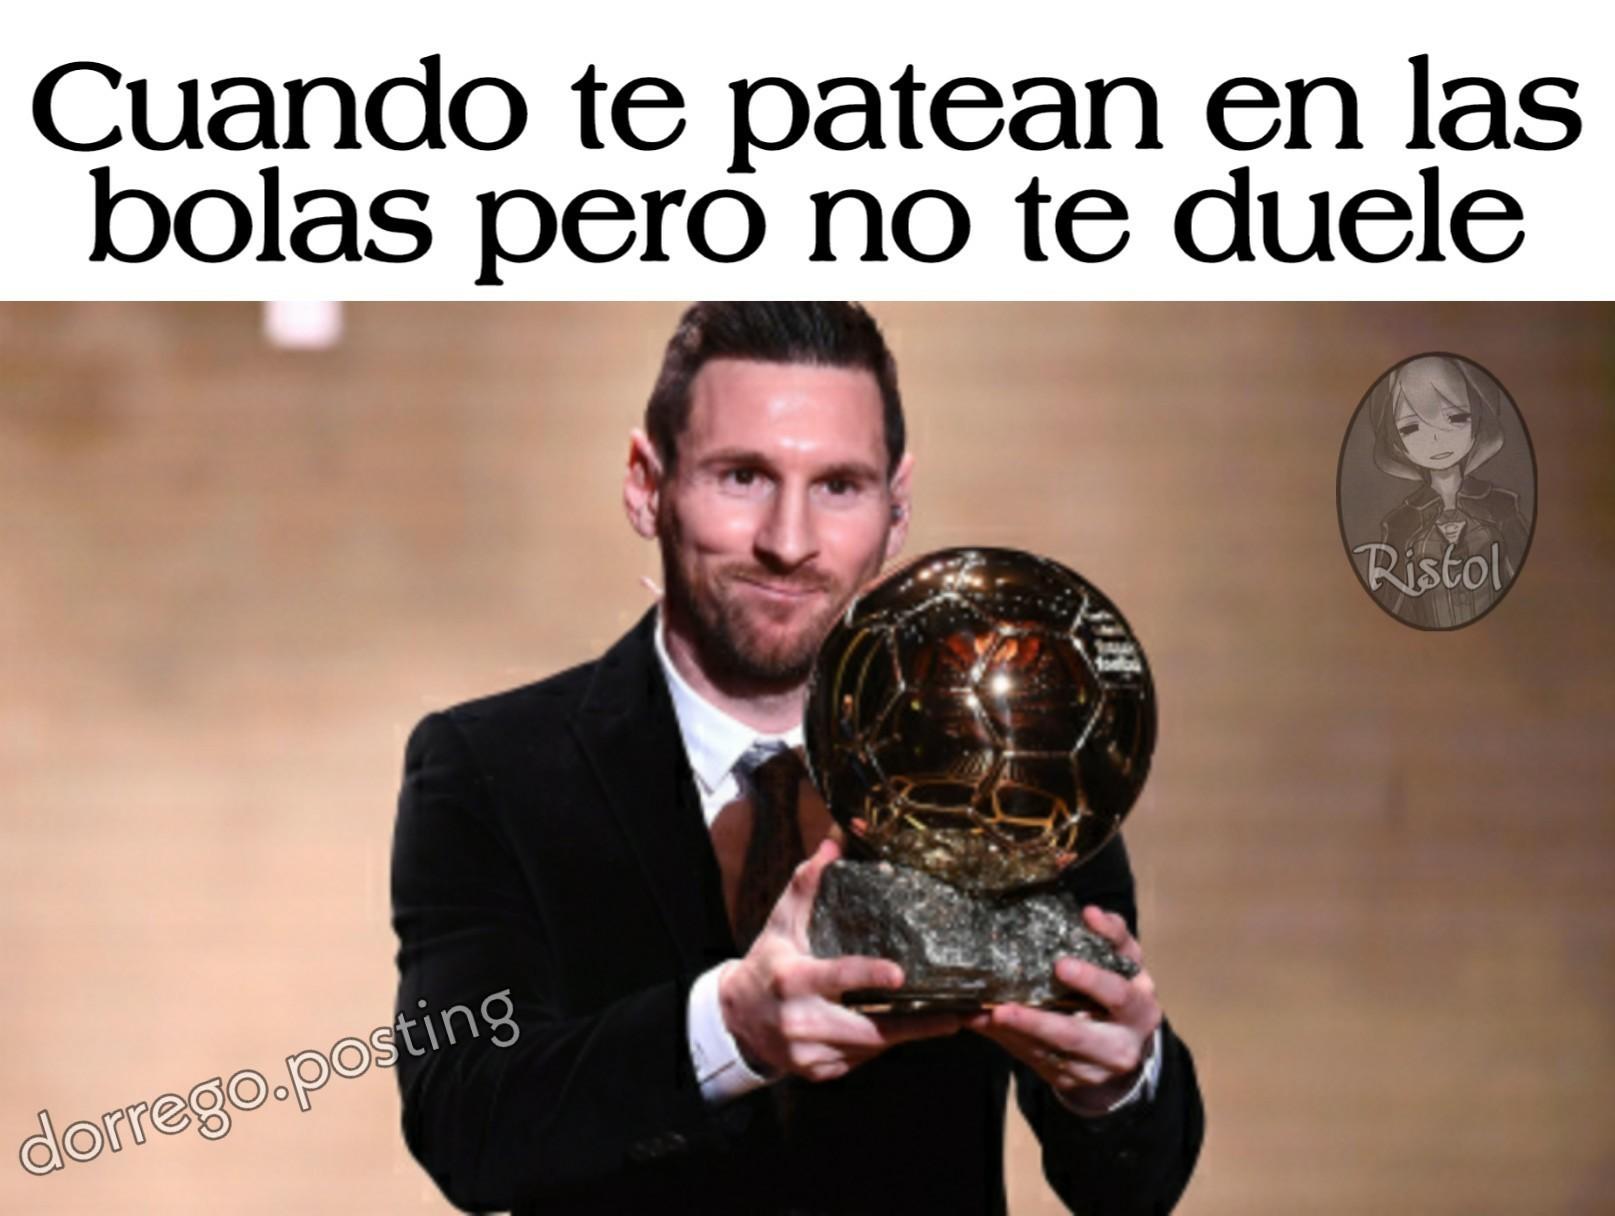 @dorrego.posting - meme